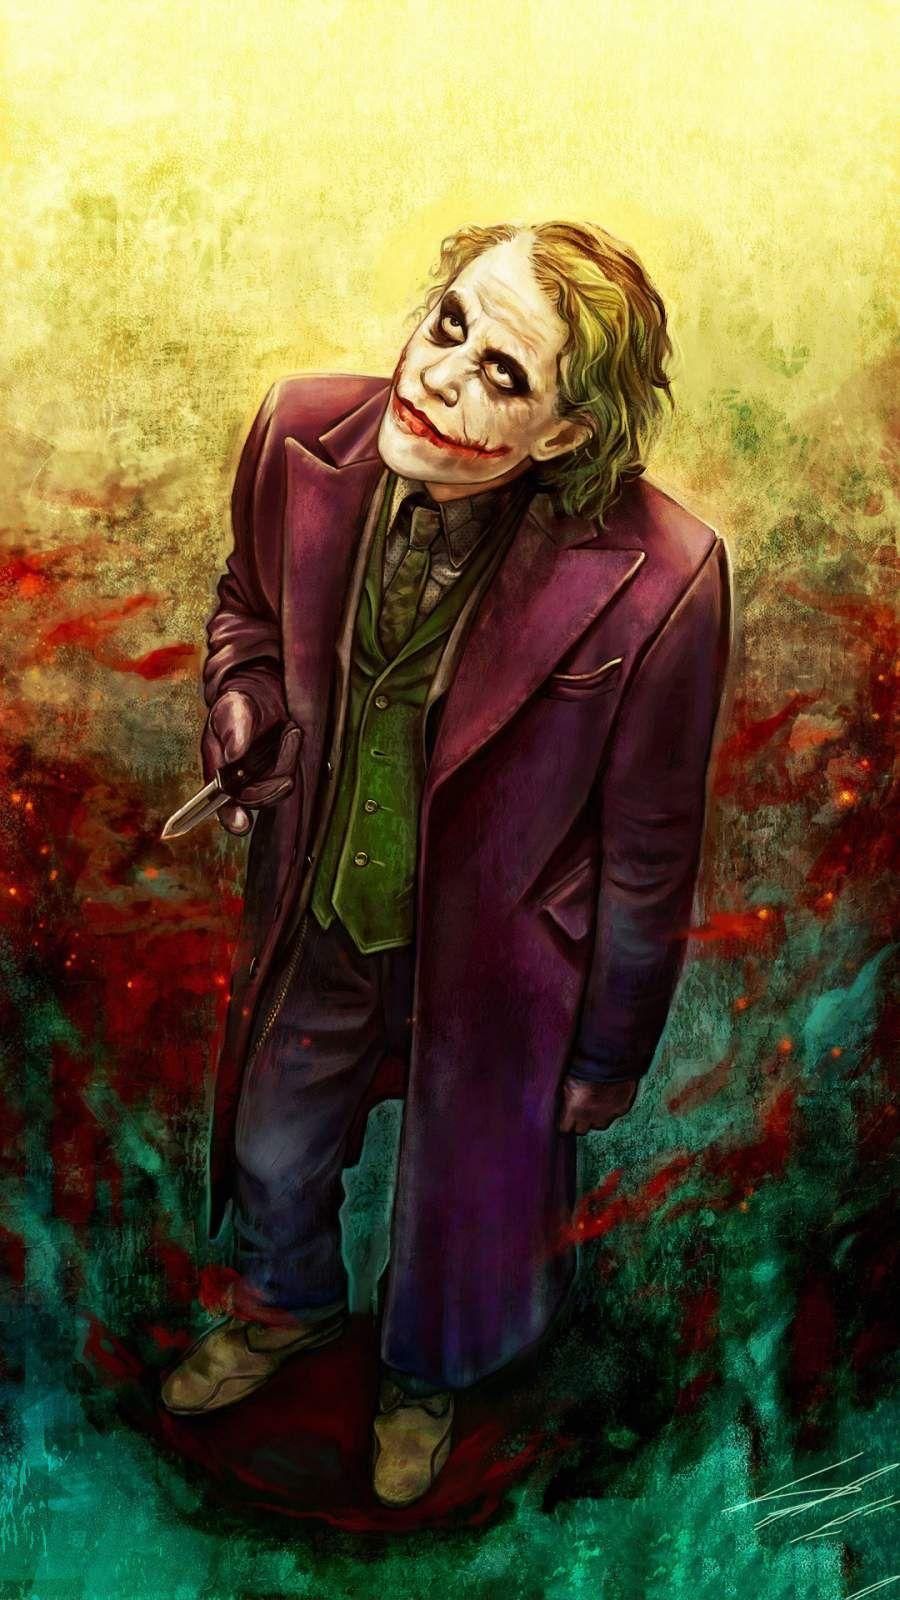 Joker Heath Ledger Art Iphone Wallpaper Joker Heath Joker Wallpapers Joker Art